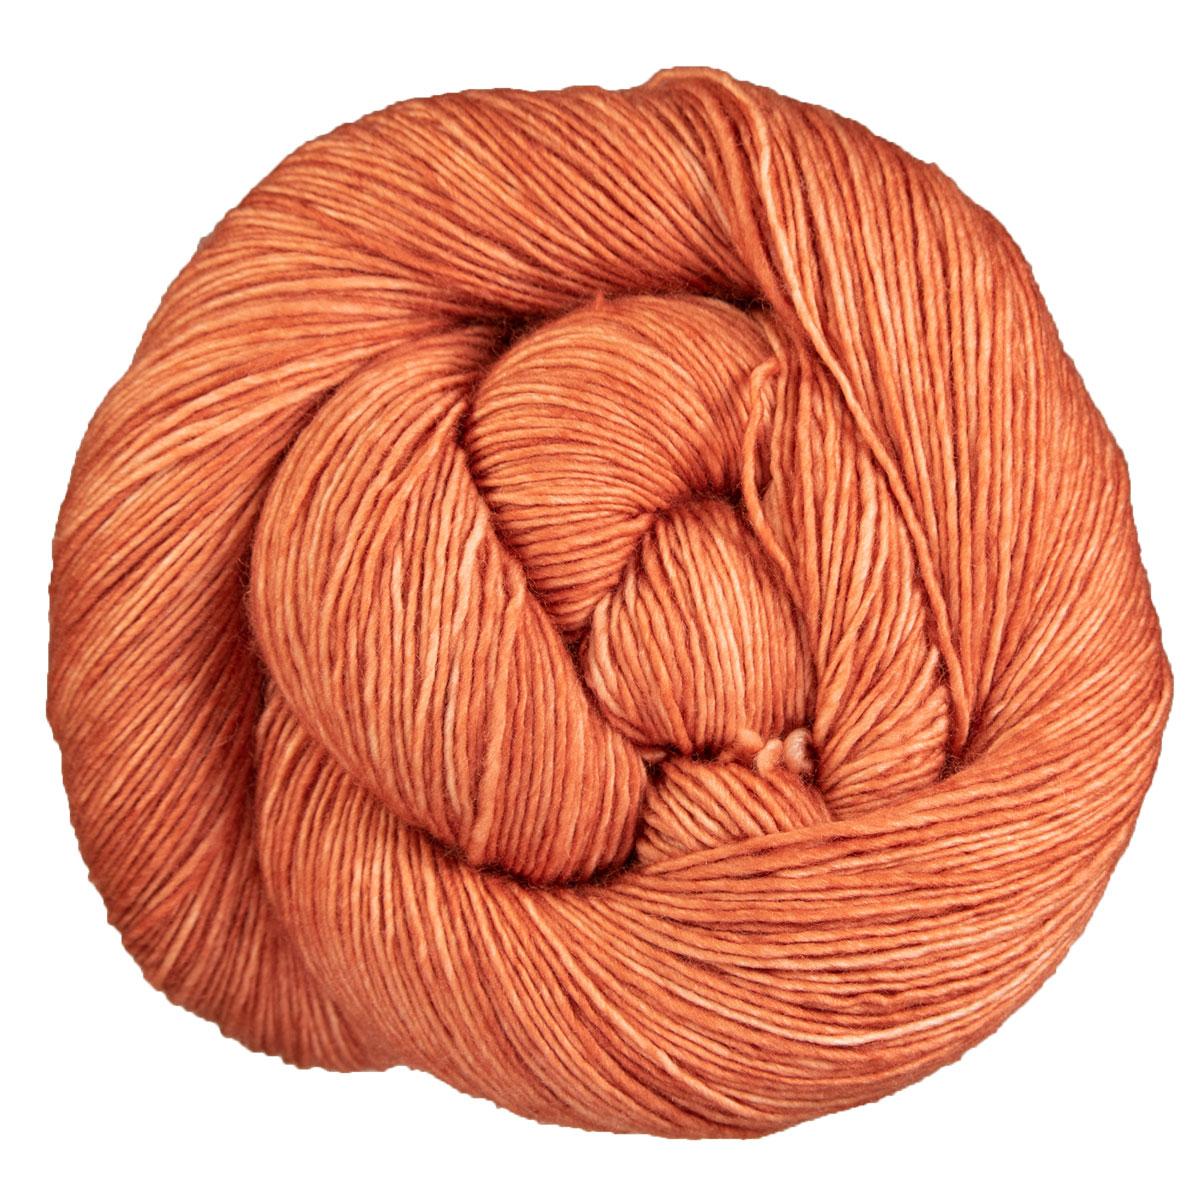 98g wool and mohair 44 yards Belle Hand spun art yarn skein